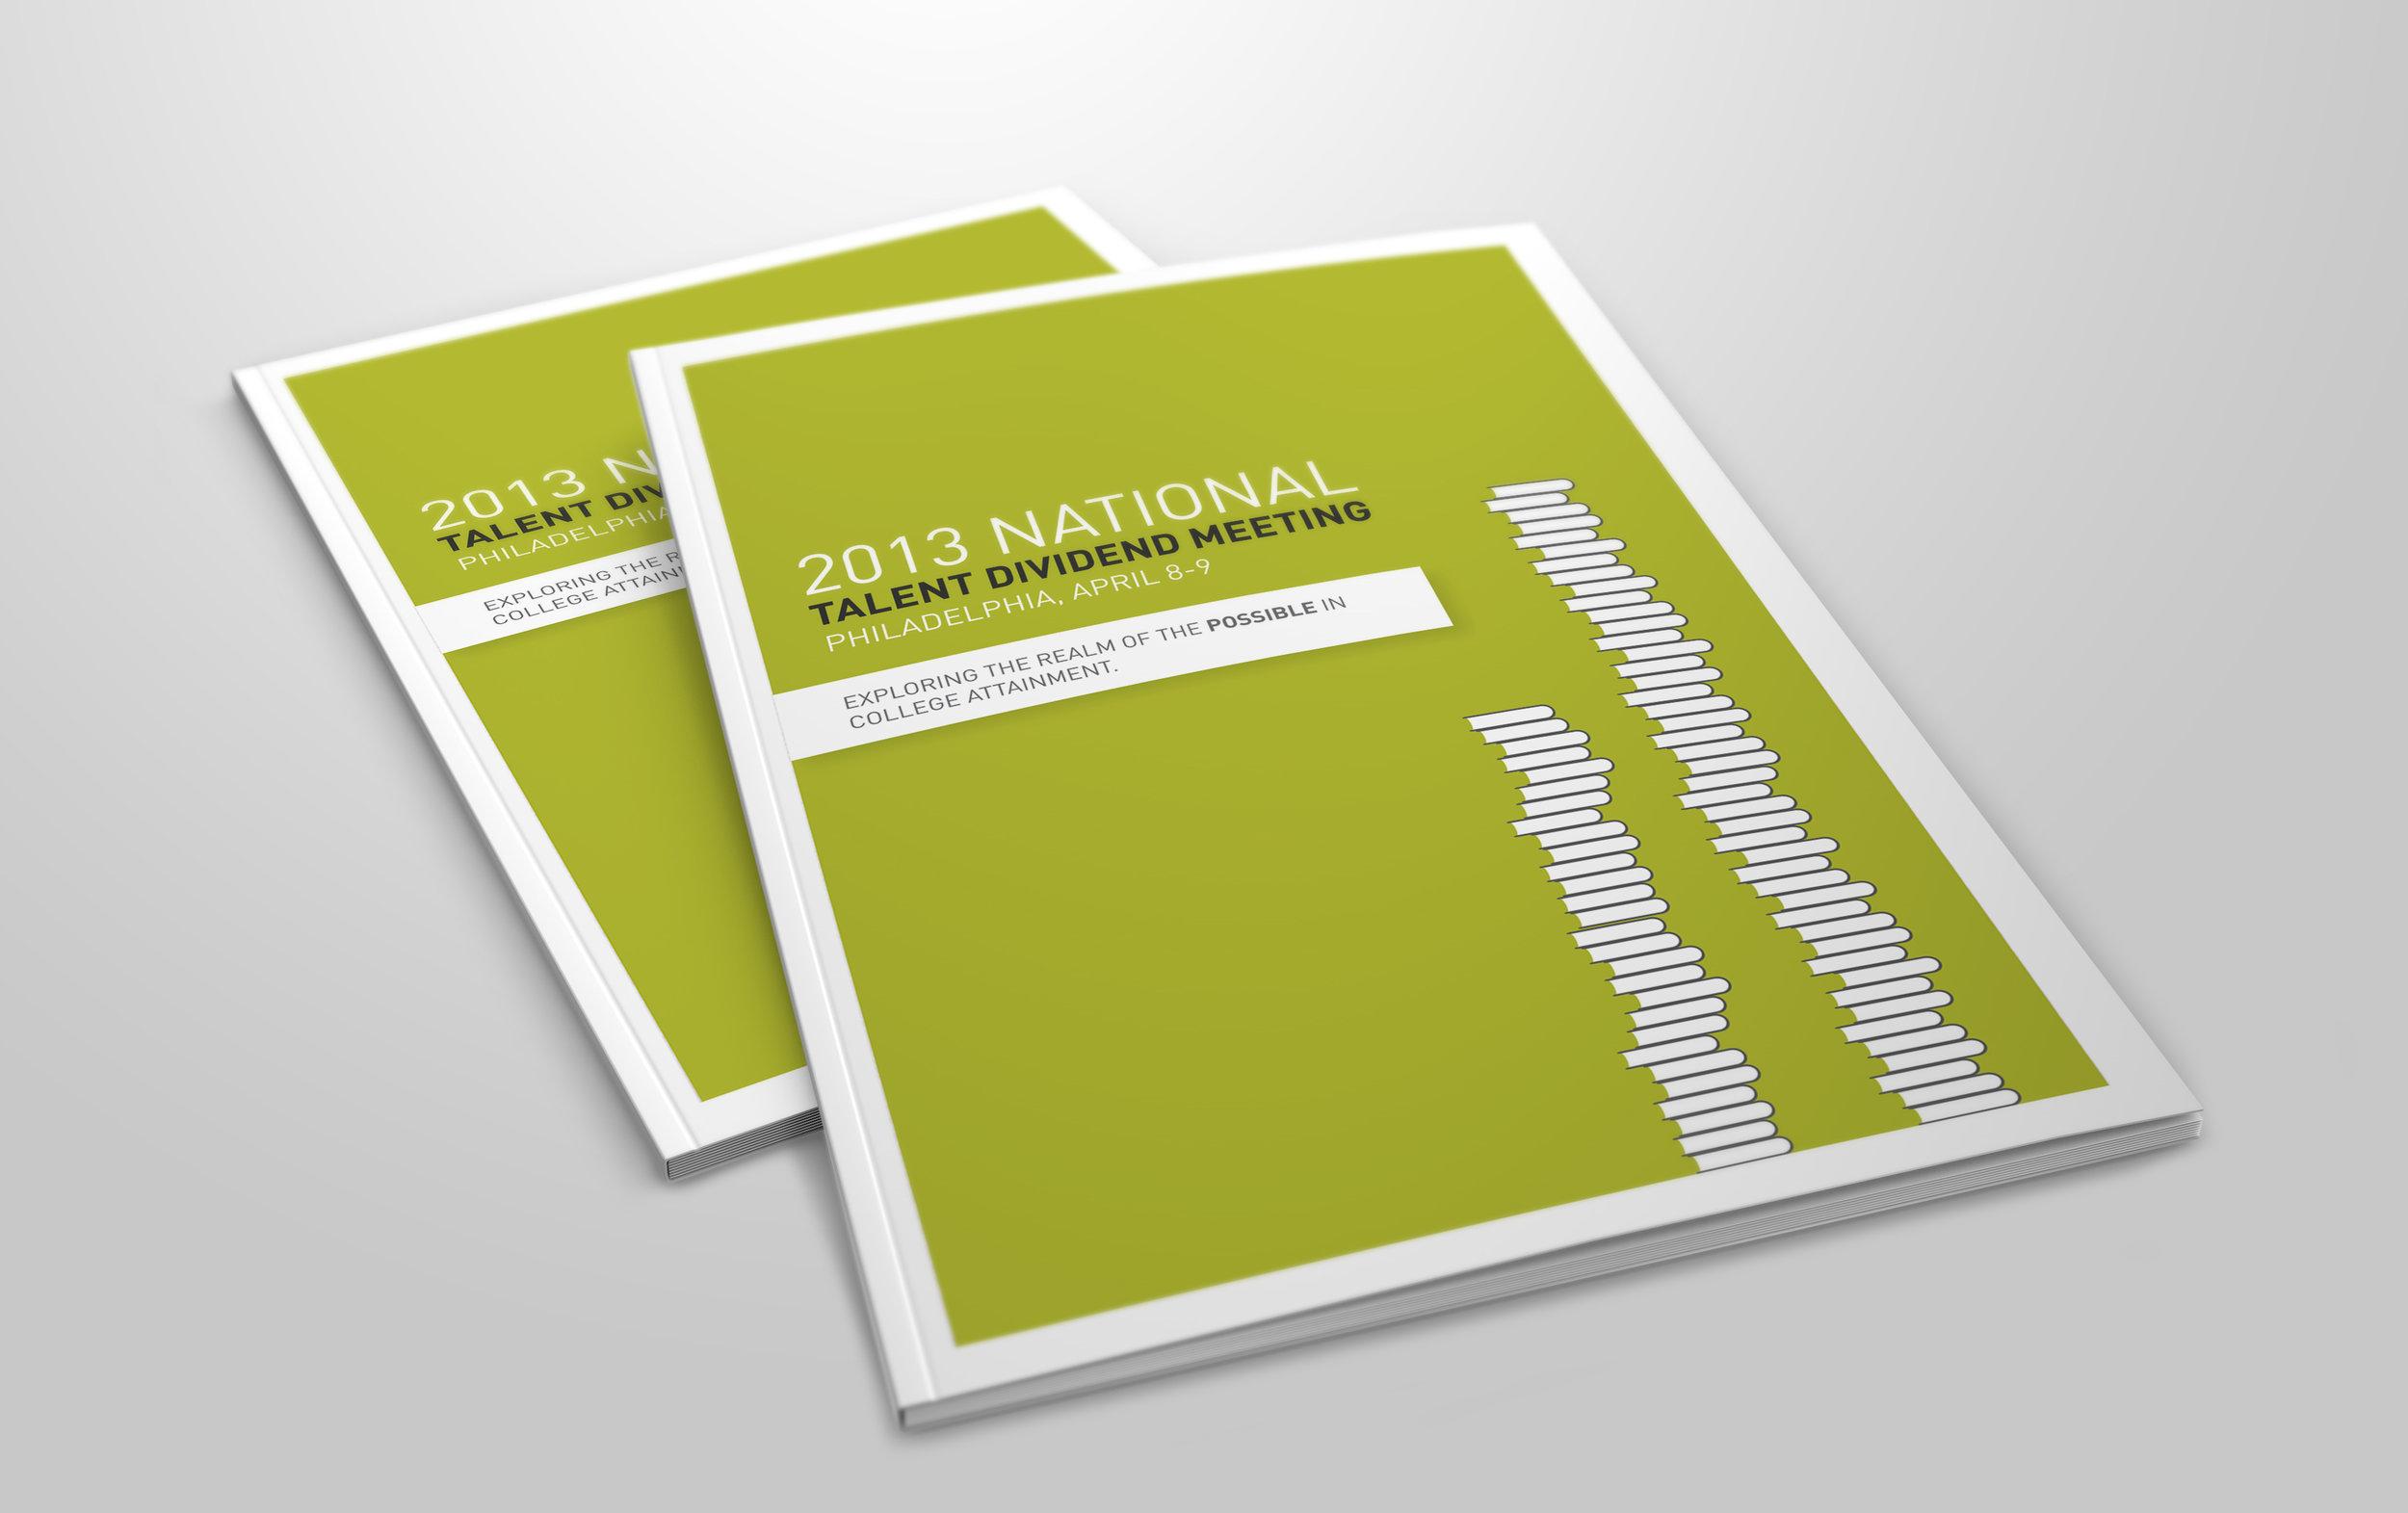 Event Program Booklet